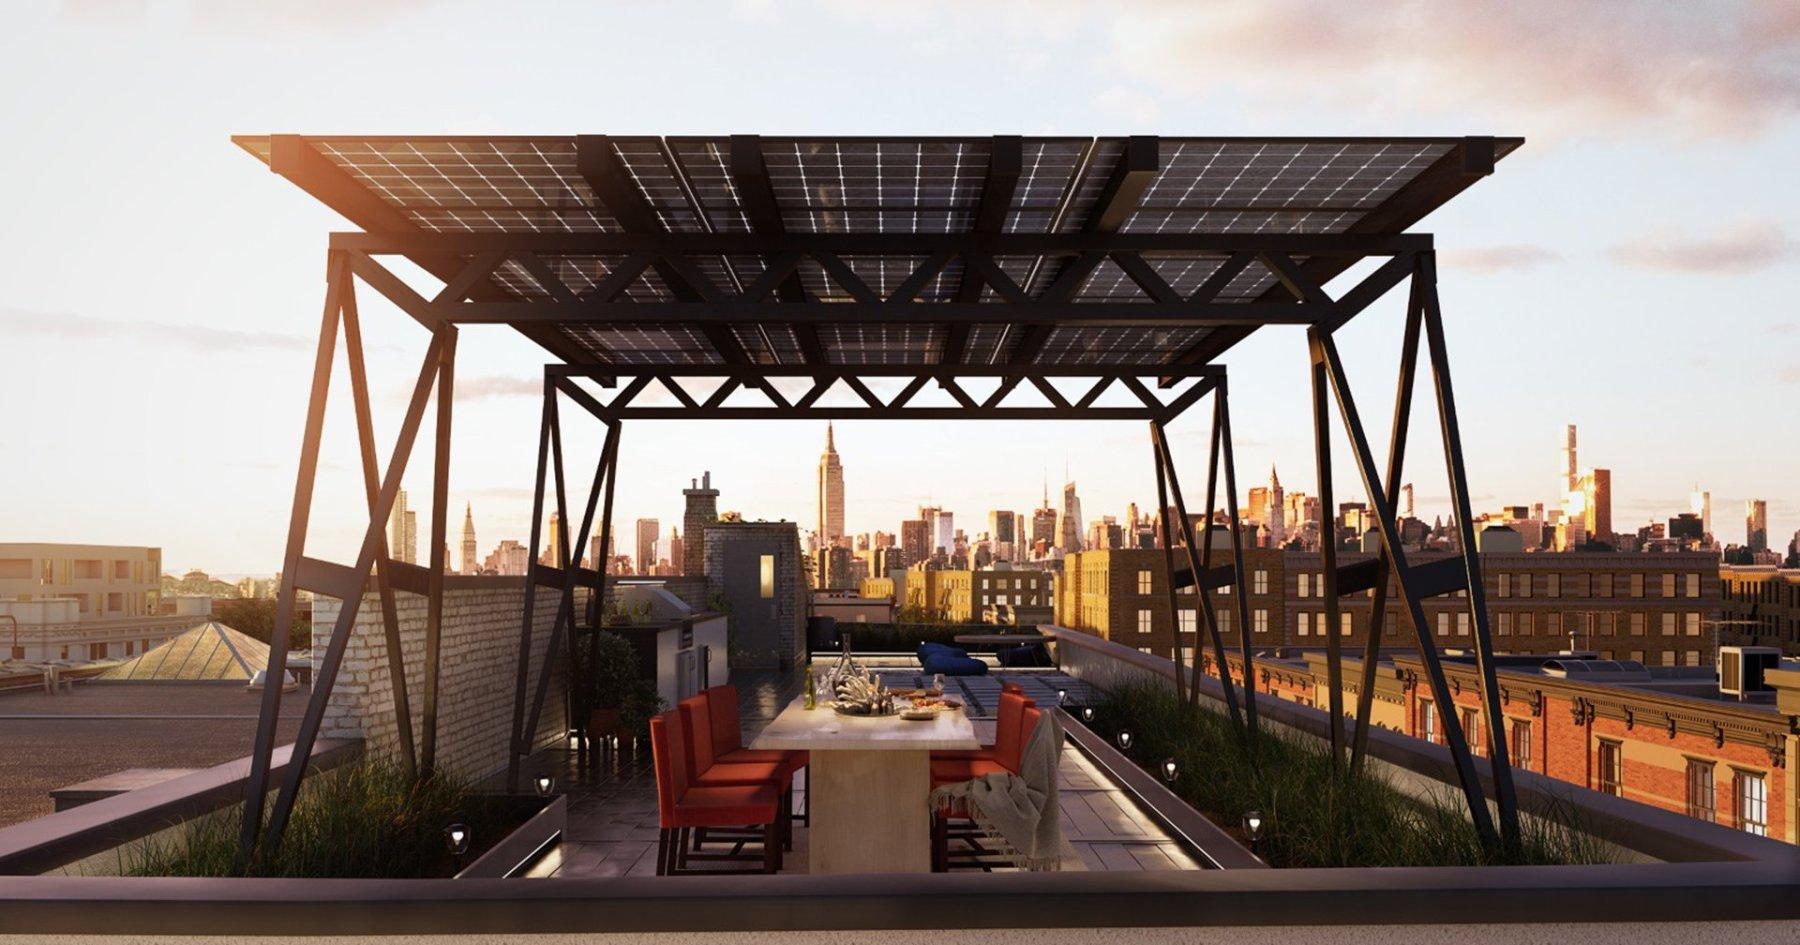 Brooklyn SolarWorks Wants to Make Solar Energy an NYC Reality